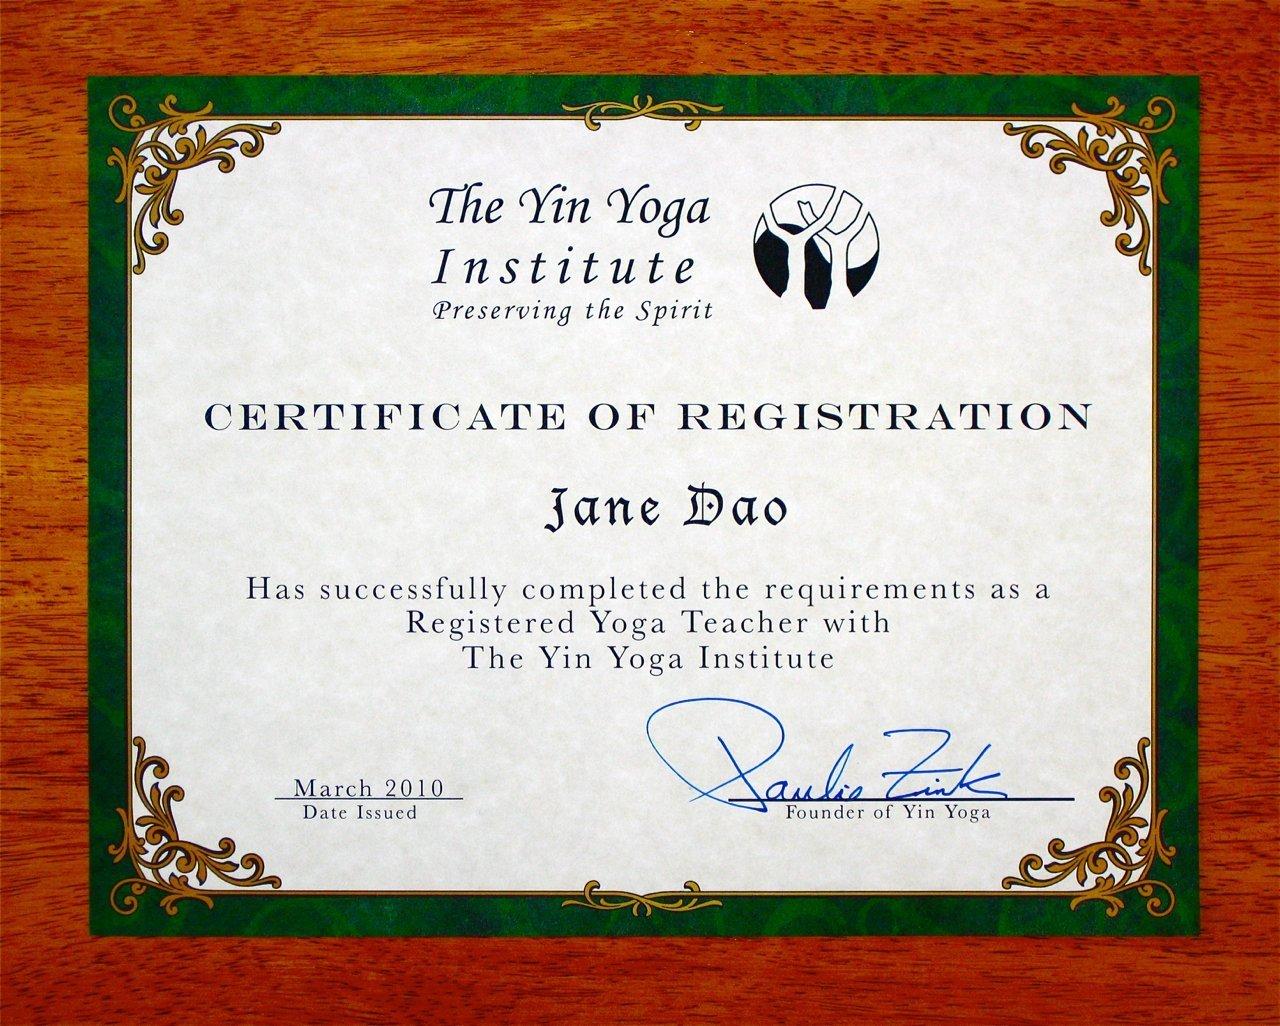 Yin Yoga Teacher Training Yin Yoga Founder Paulie Zink